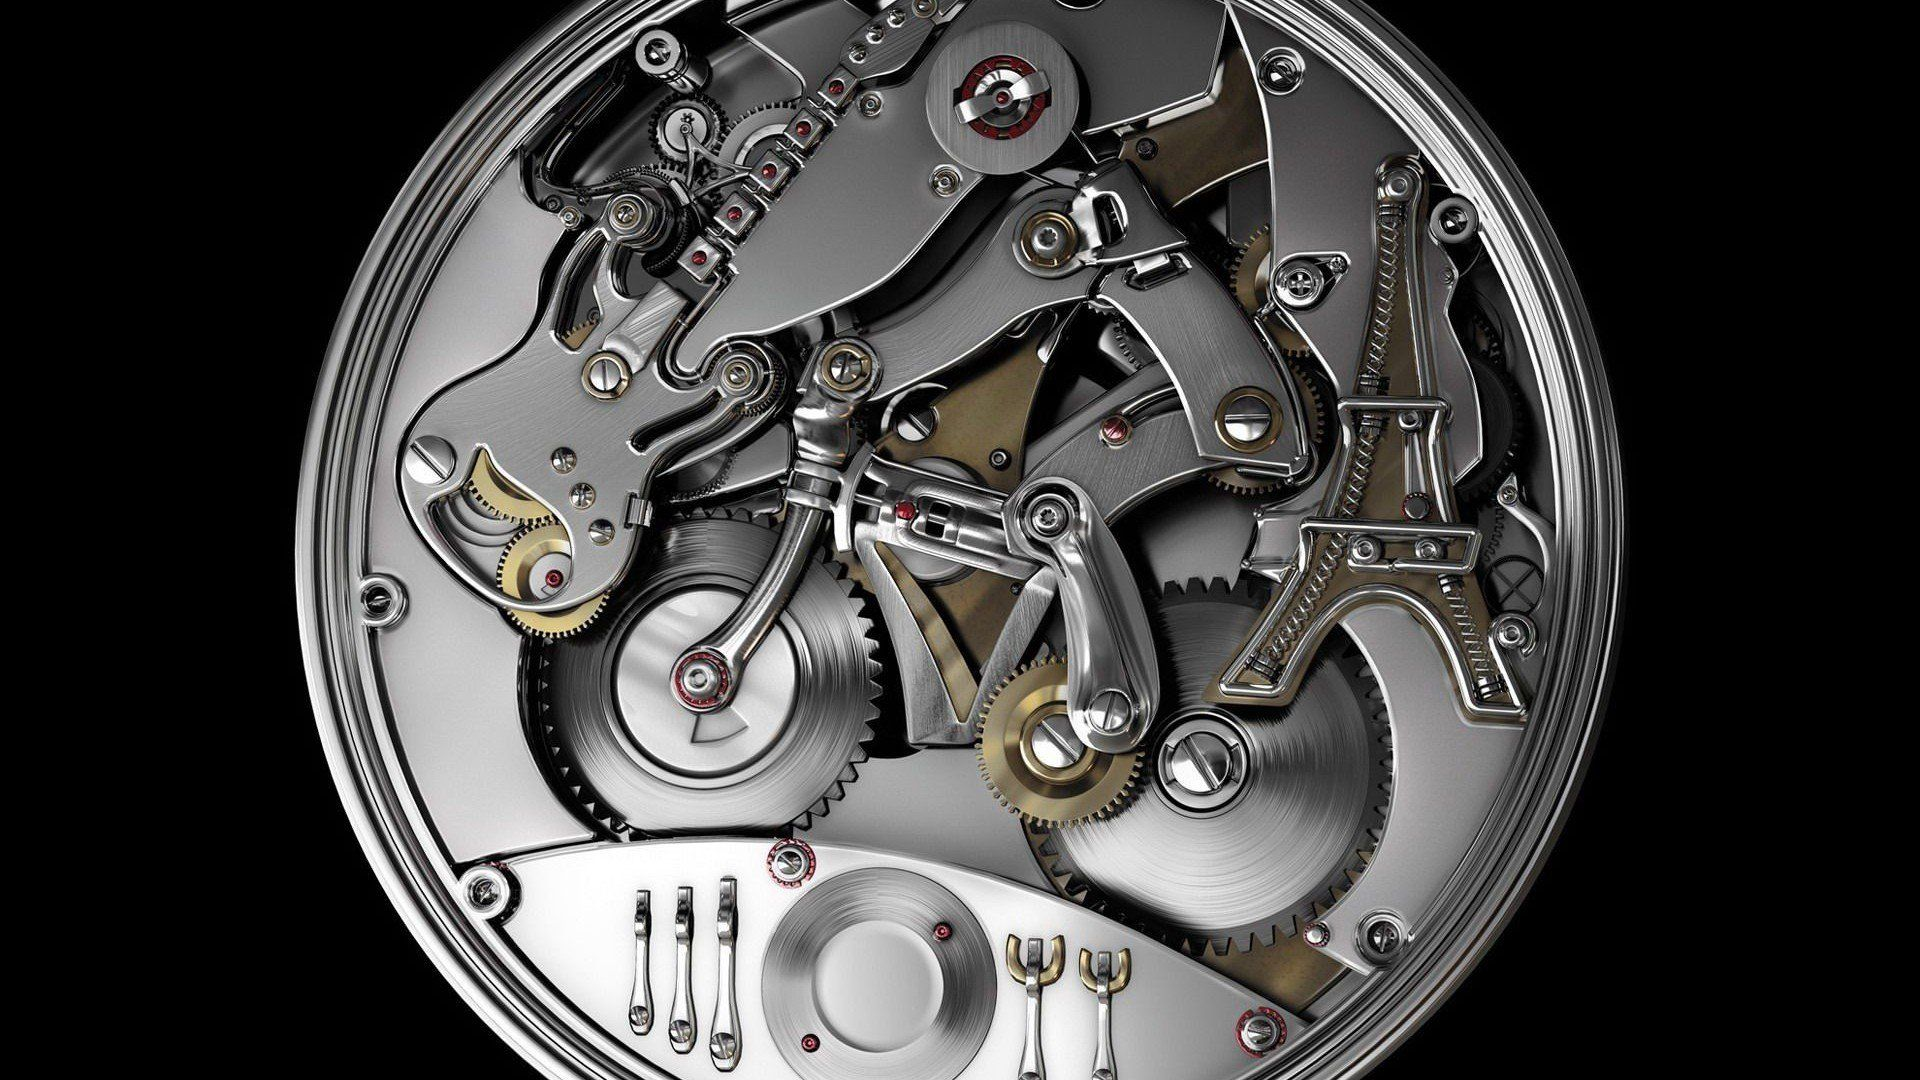 Best Rolex Wallpaper - 49c7b60c6cb13de869b584842b1685c9 Graphic_539779.jpg